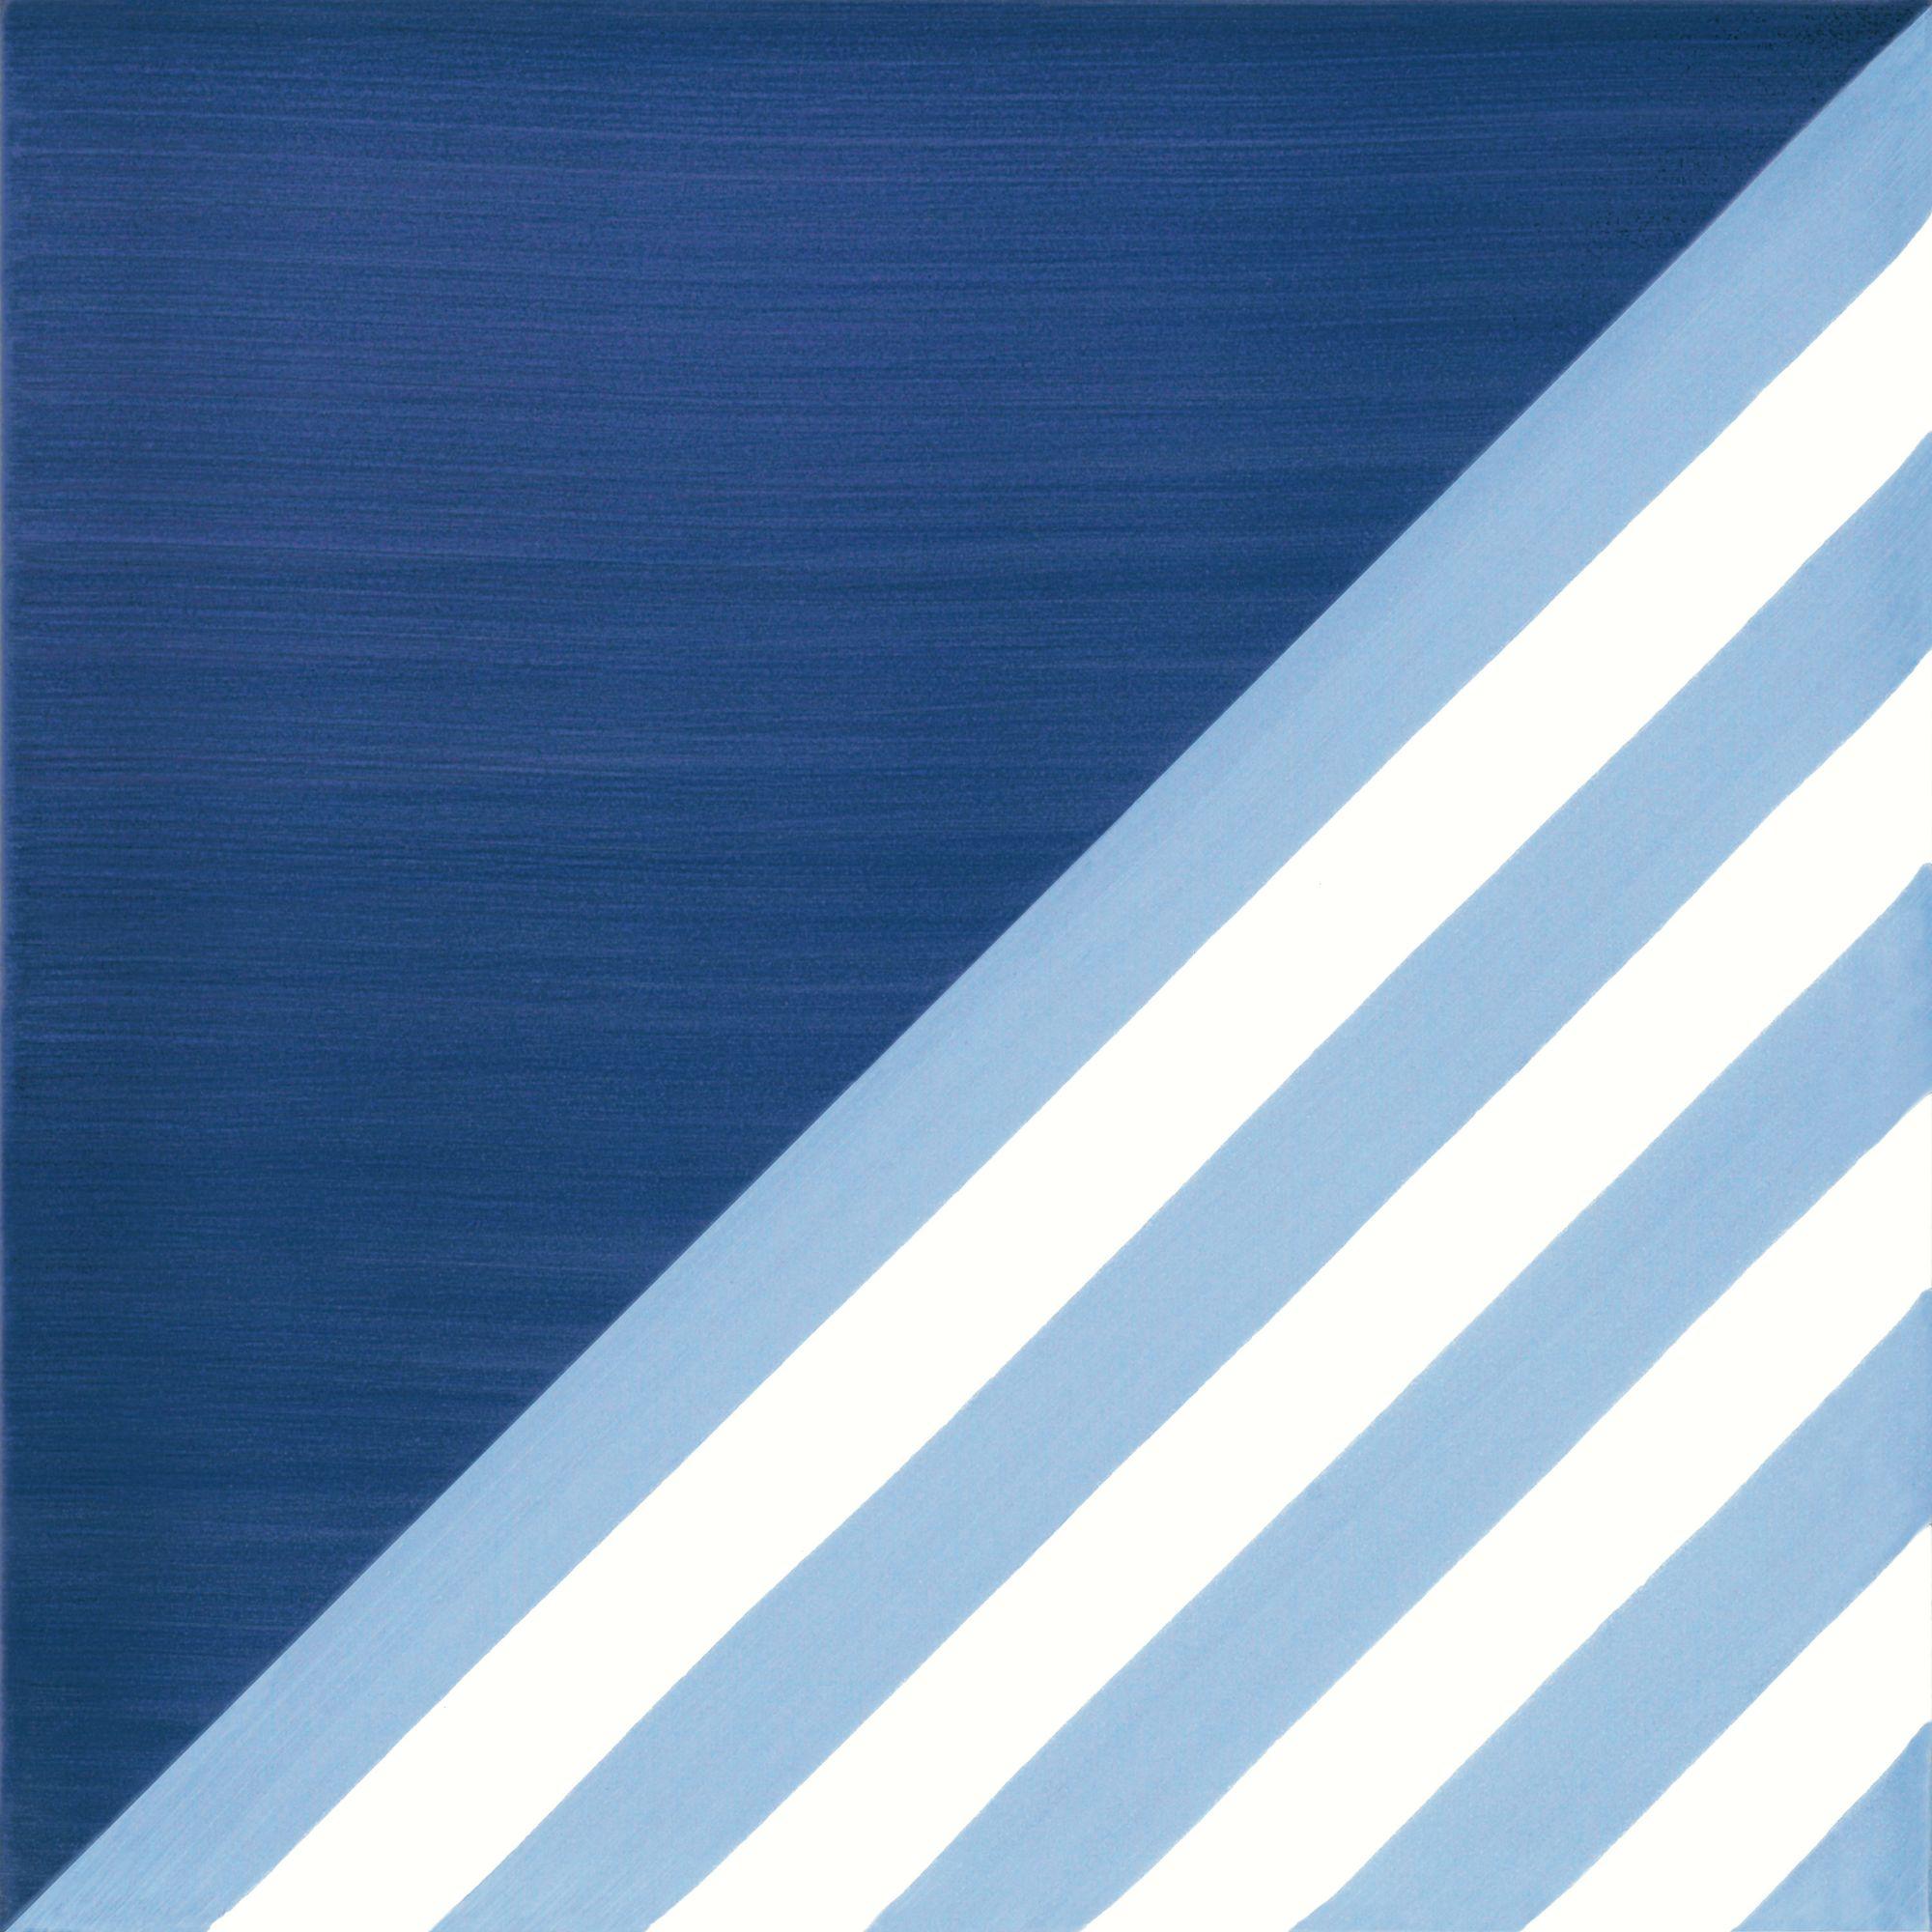 blu-ponti-decoro-tipo-33